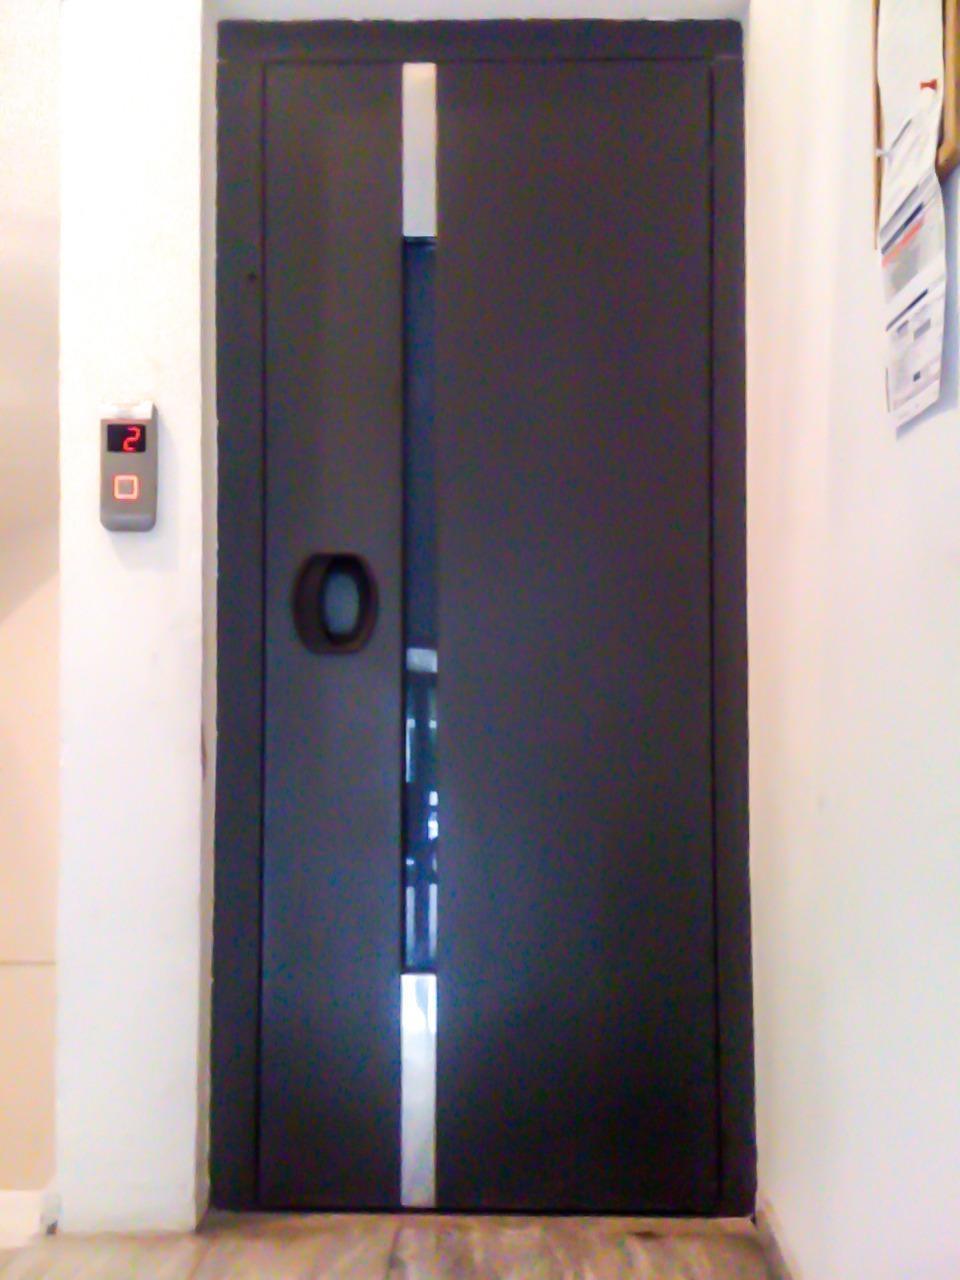 zlift-erga-lifts-11 Εγκατάσταση Ανελκυστήρα - Ρόδος